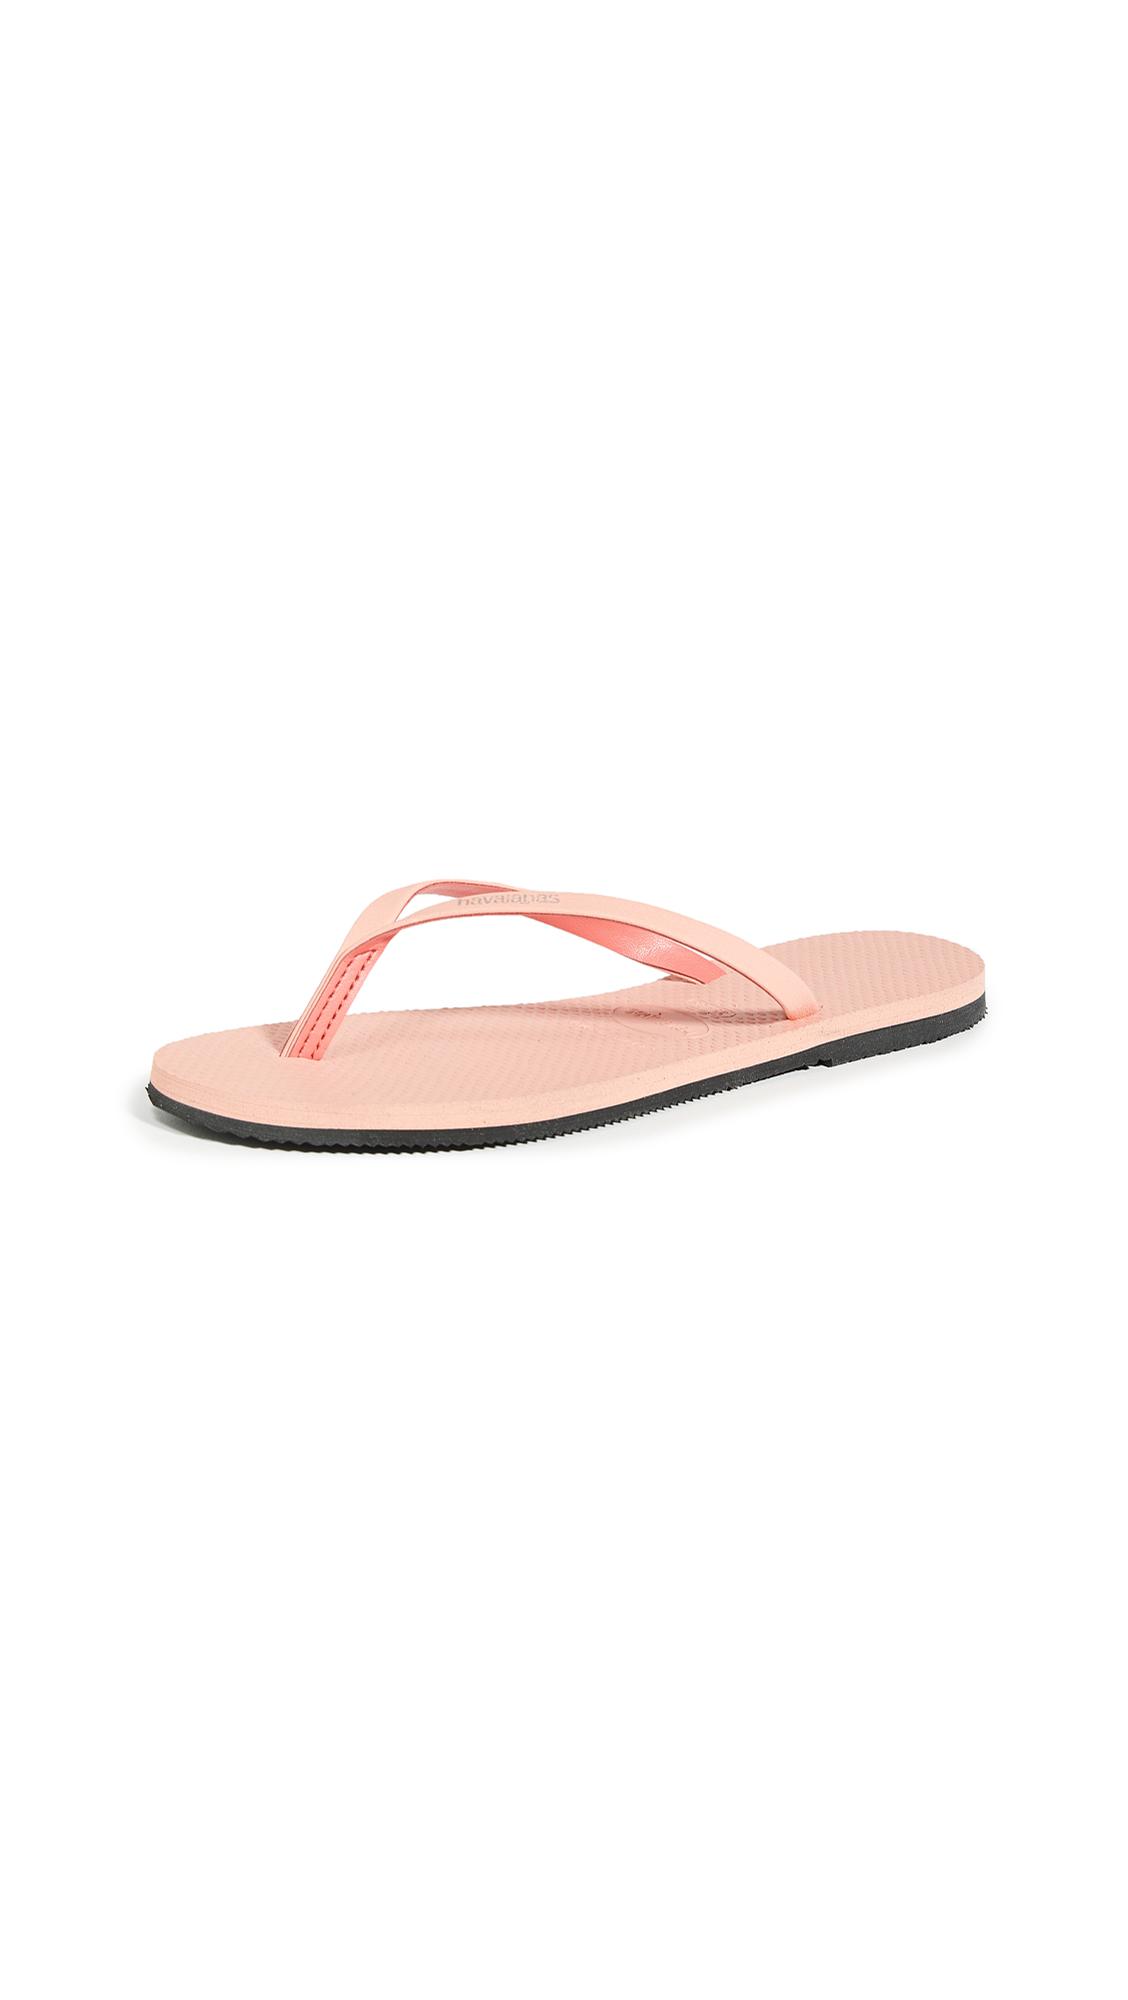 Buy Havaianas You Rainbow Pop Flip Flops online, shop Havaianas